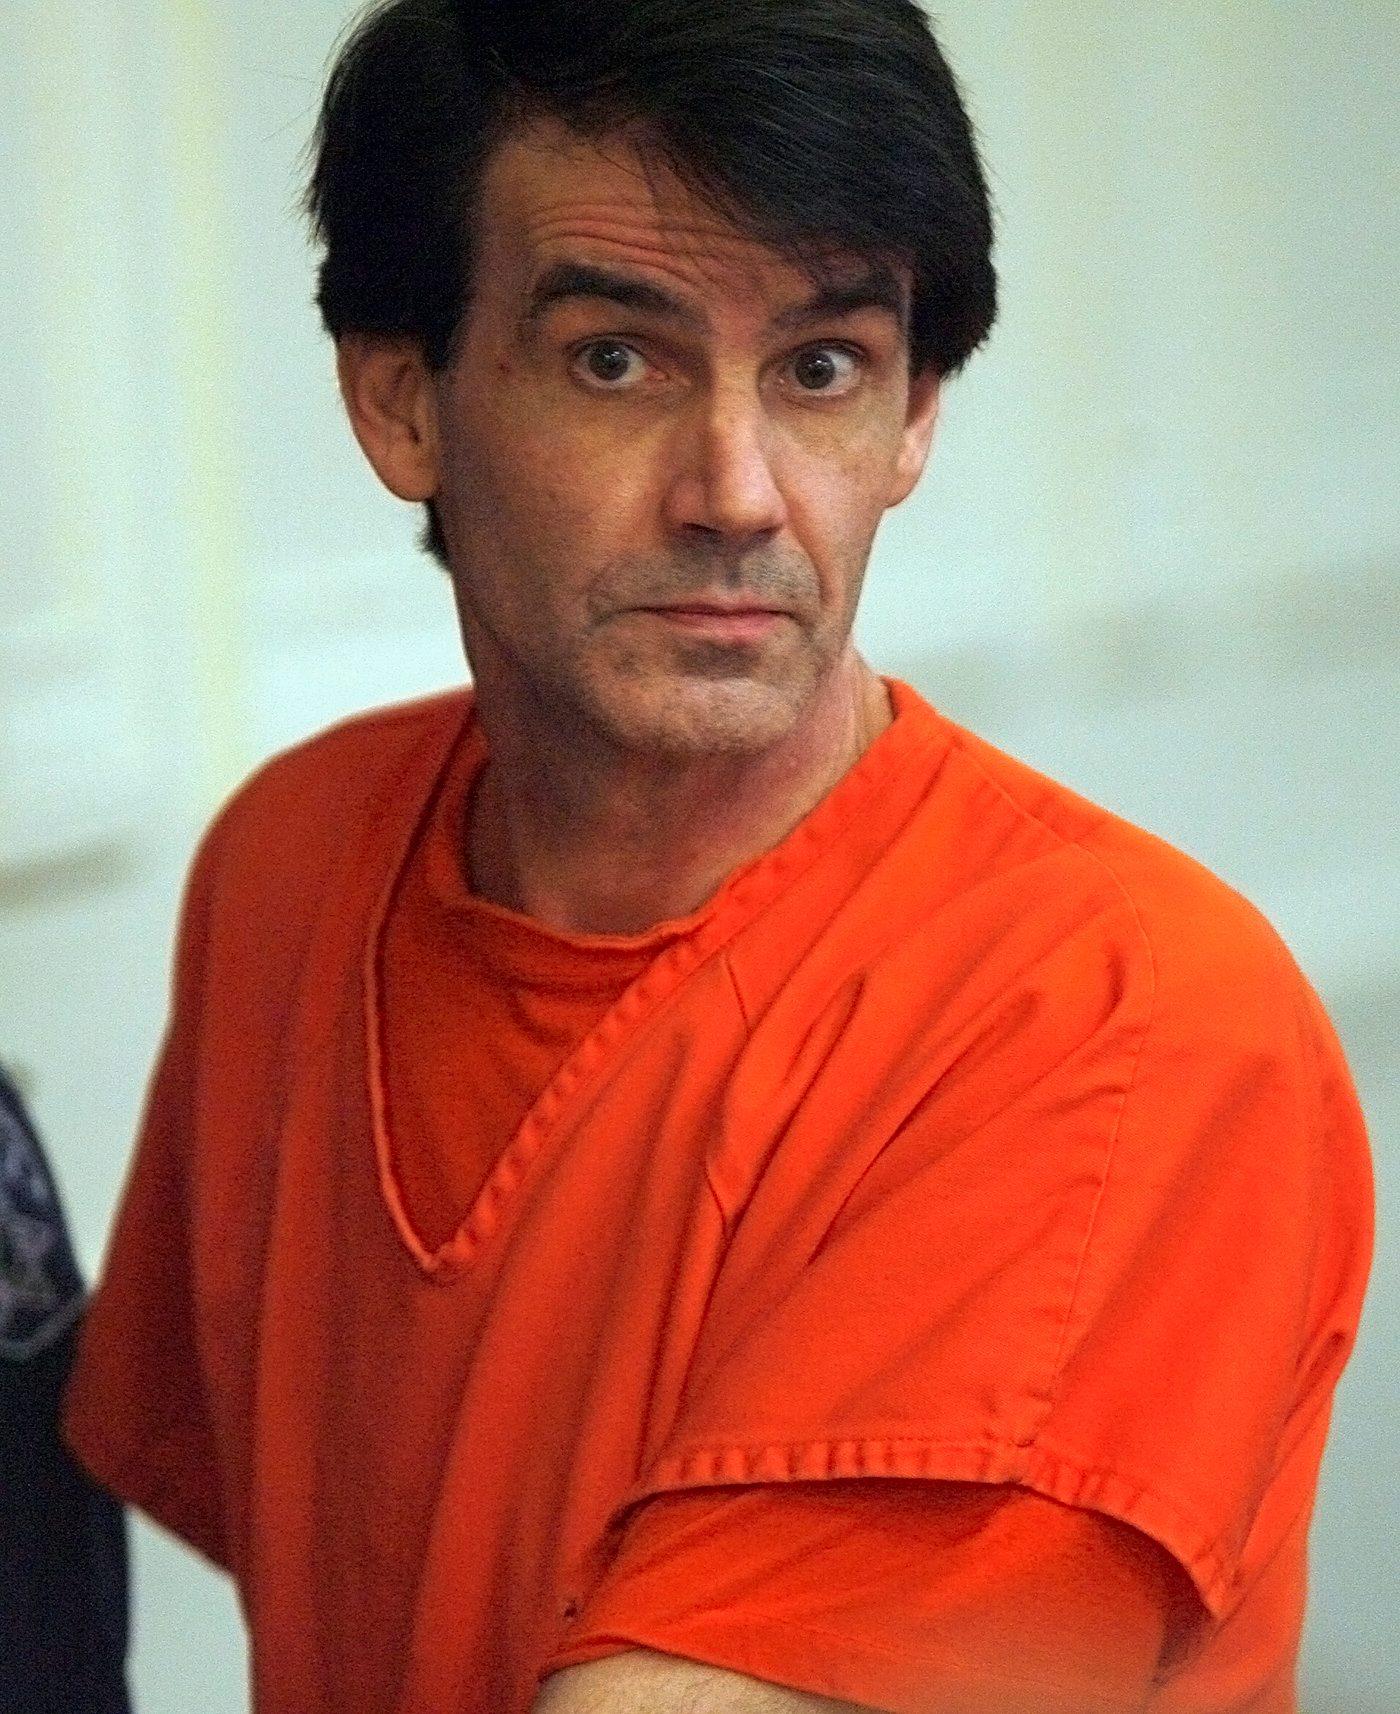 Kraig Kahler insanity defense hits Supreme Court